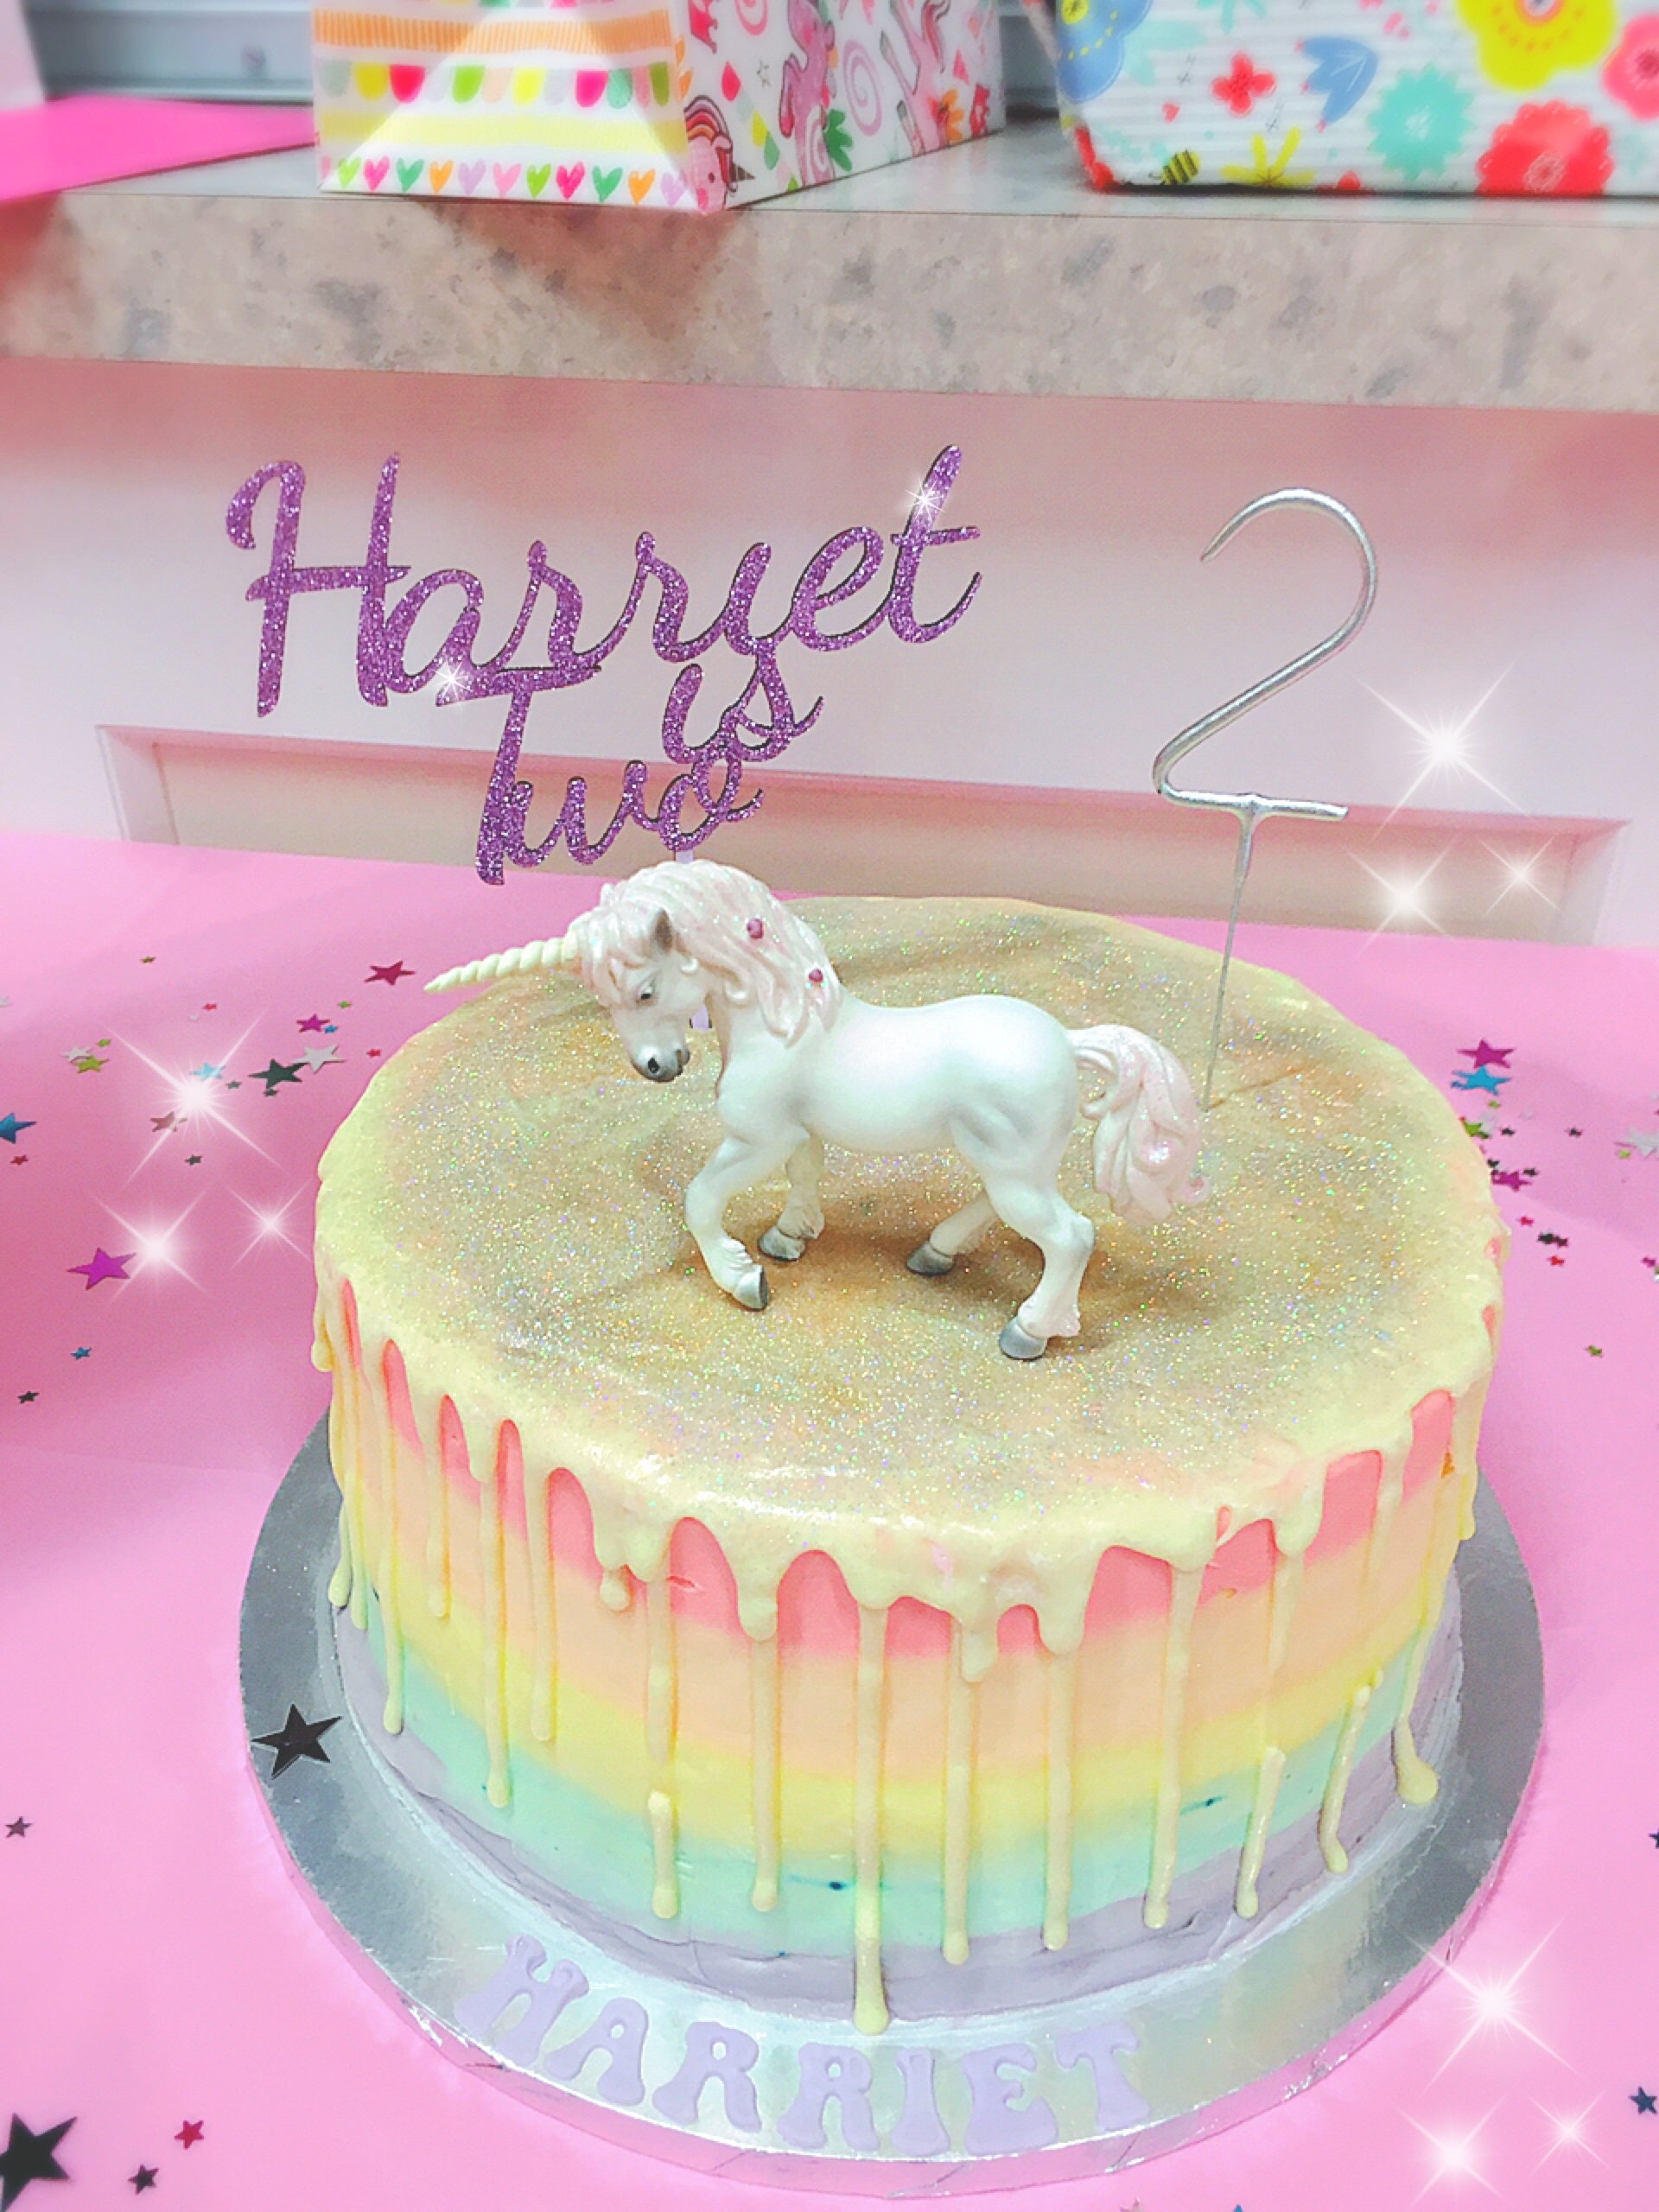 Personalised Aged Cake Topper Wooden Cake Topper Glitter Cake